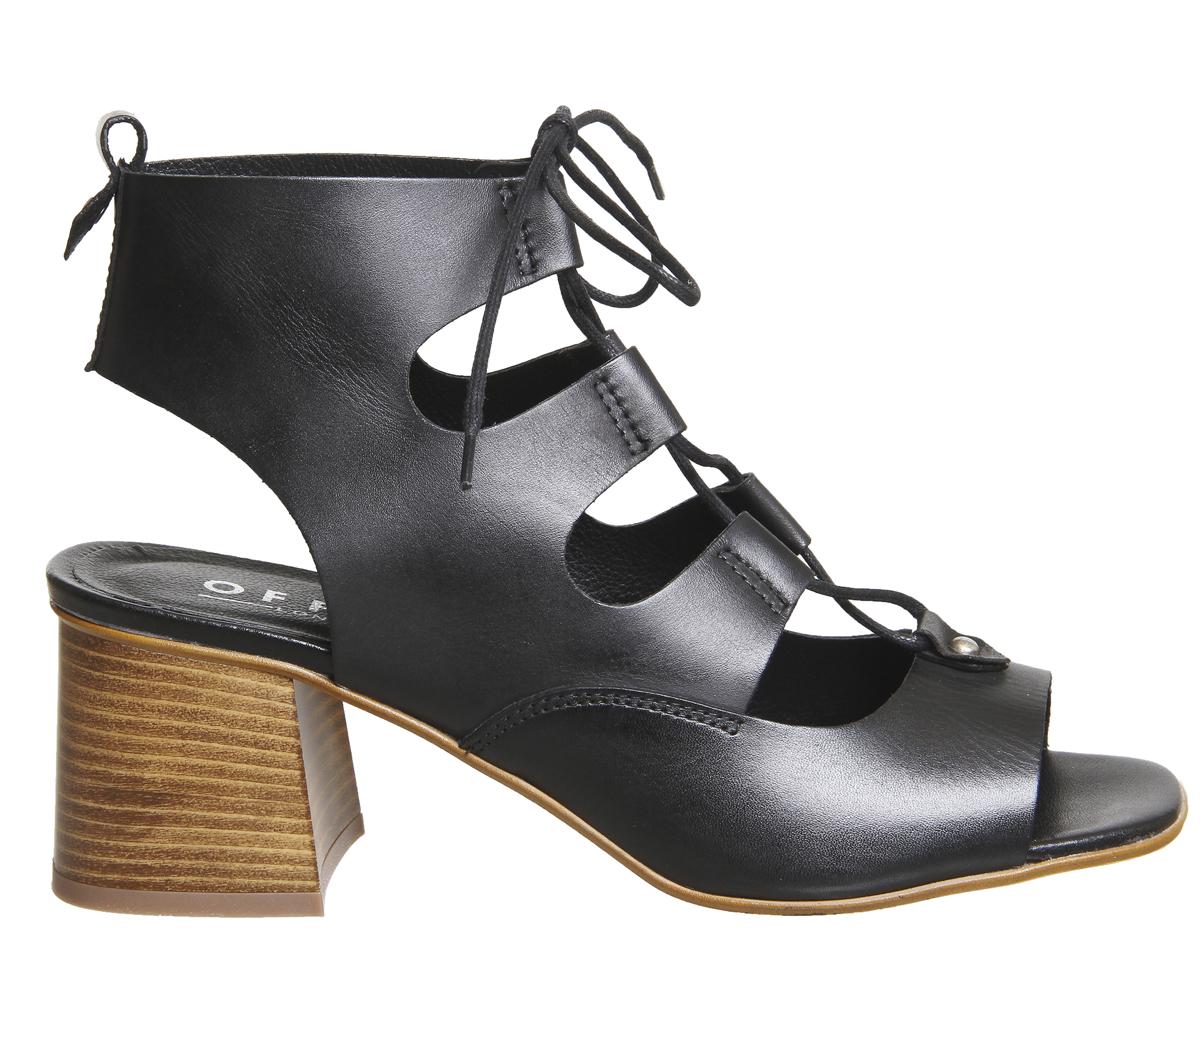 566ff4e8b26 Sentinel Womens Office Mallorca Ghillie Block Heels Black Leather Heels